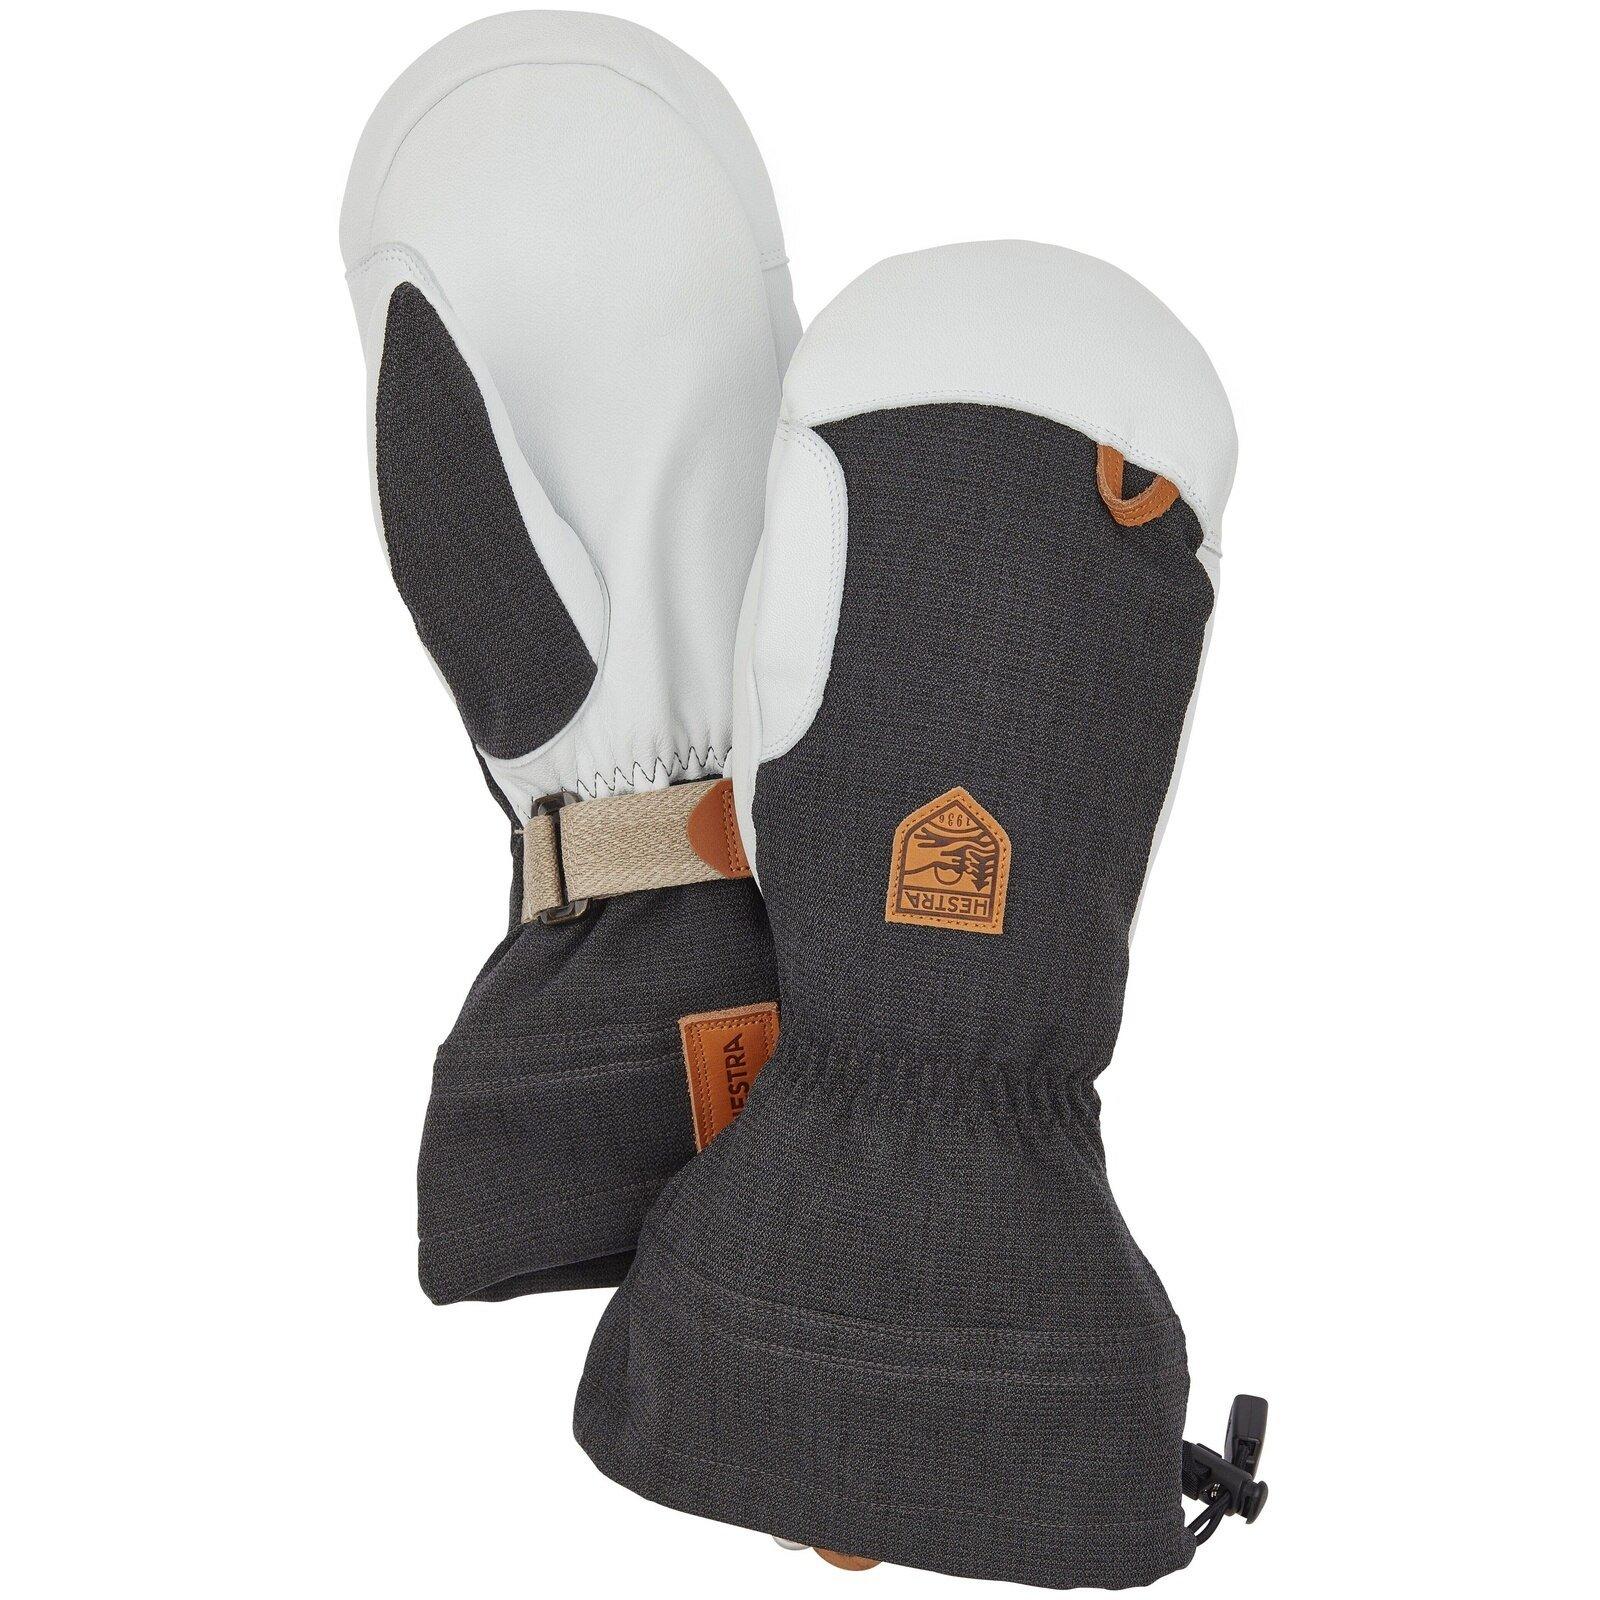 Hestra Army Leather Patrol Gauntlet Mitt - Charcoal